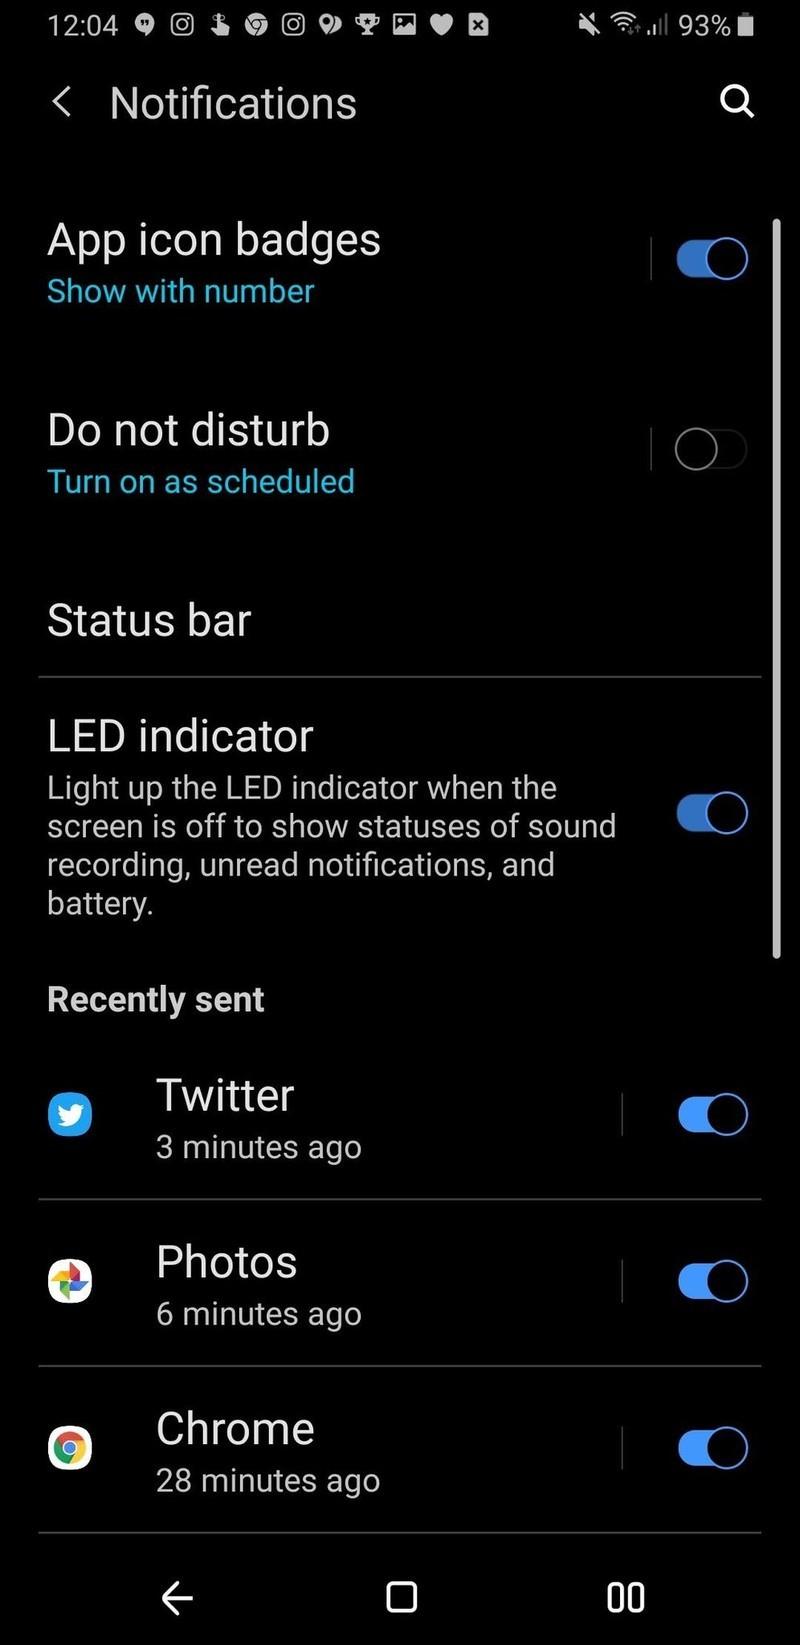 s9-plus-oneui-notifications-main-3-notif